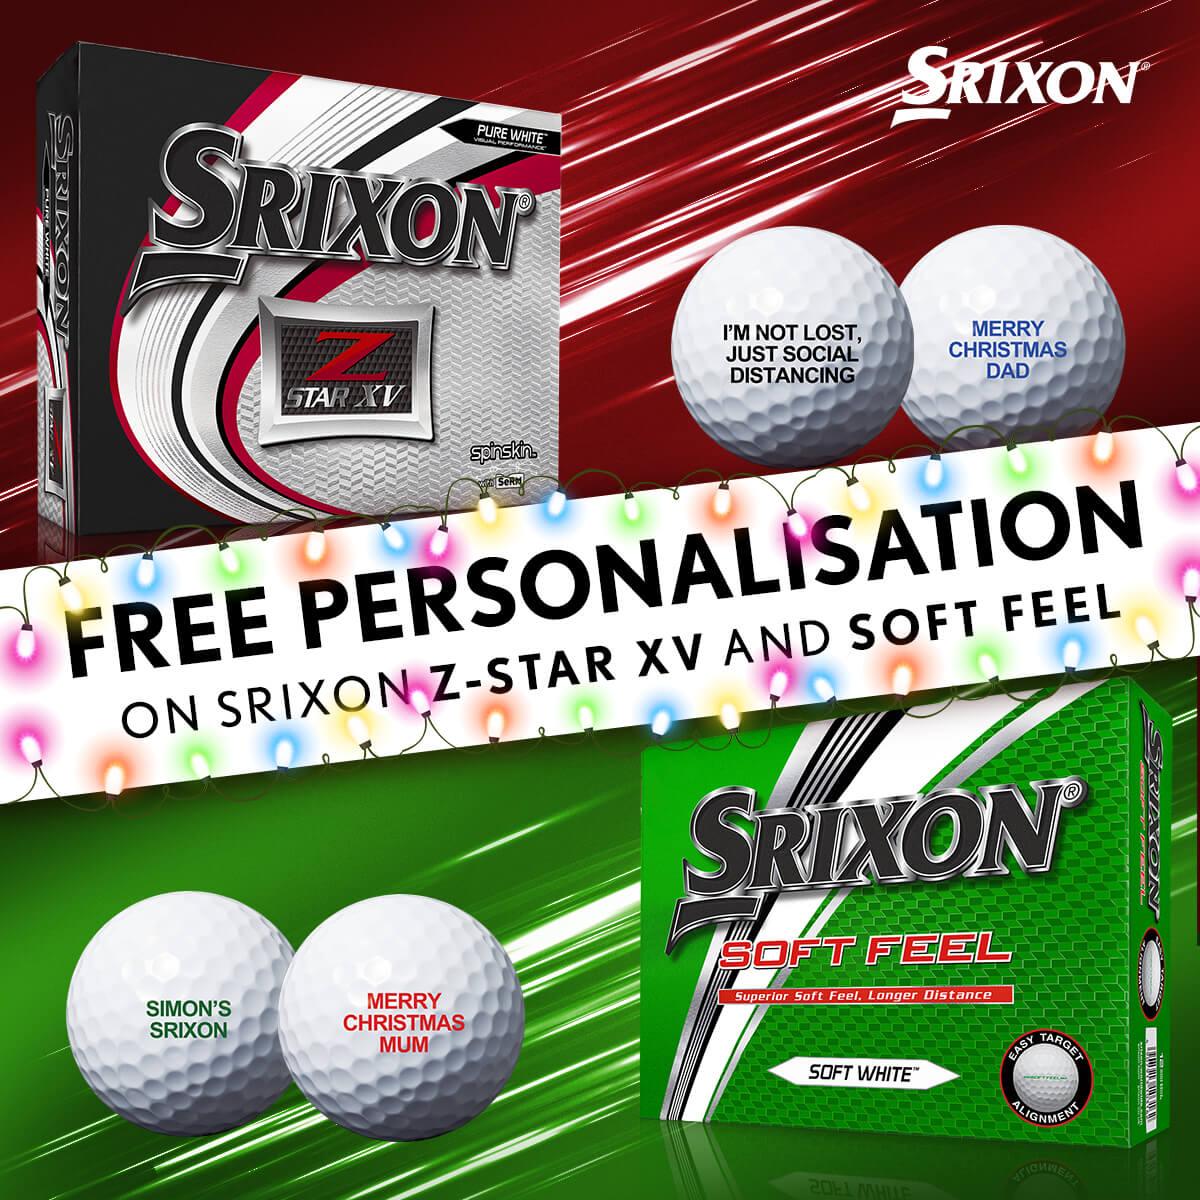 SRIXON FREE PERSONALISATION XMAS 2020